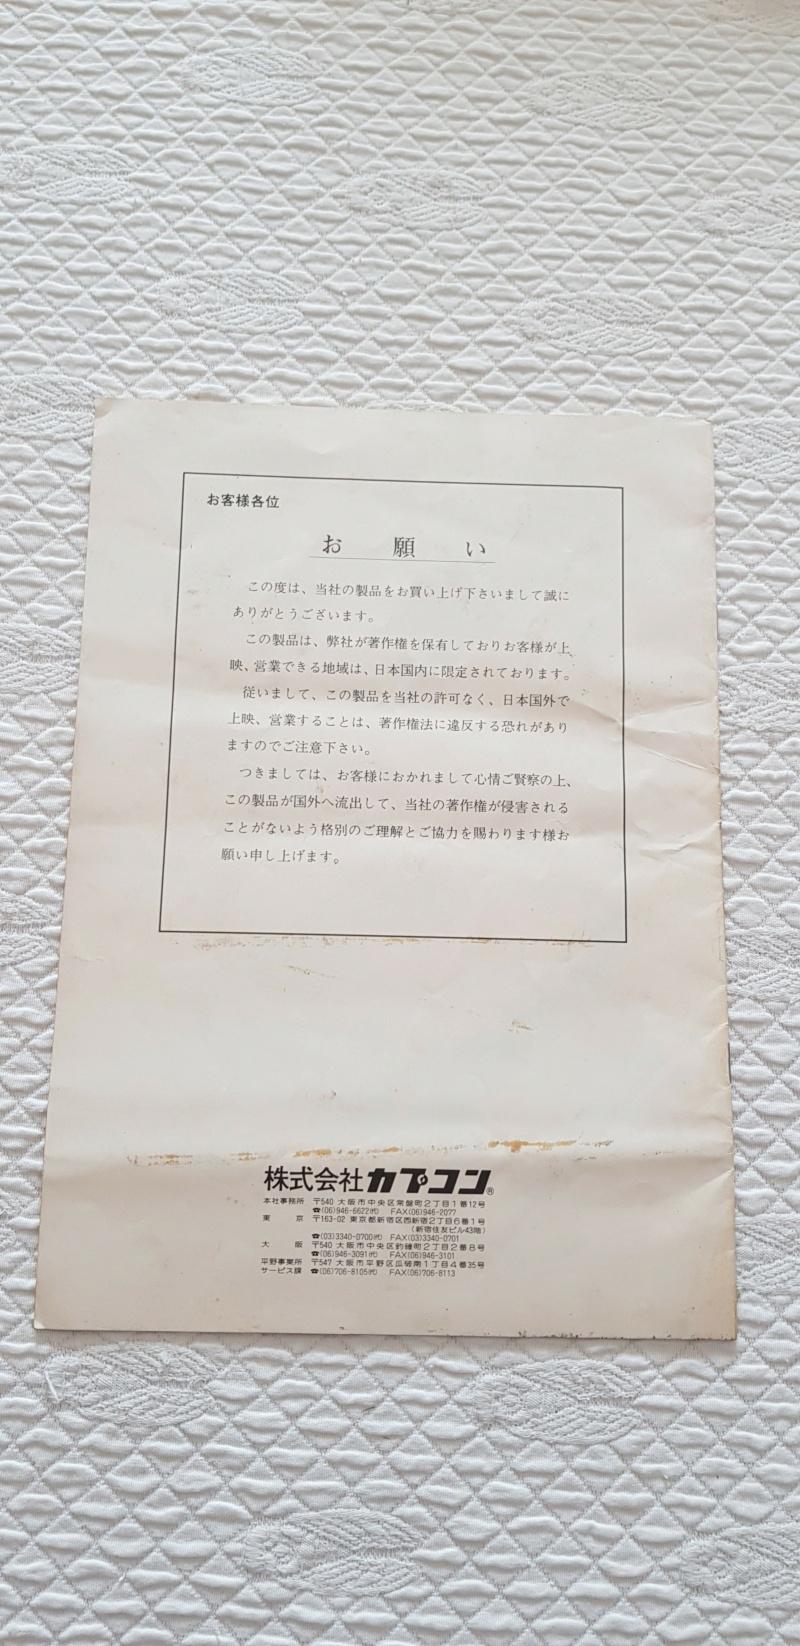 [Vendu] Cadillacs and Dinosaurs Cadillacs Kyouryuu-Shinseiki 20210331